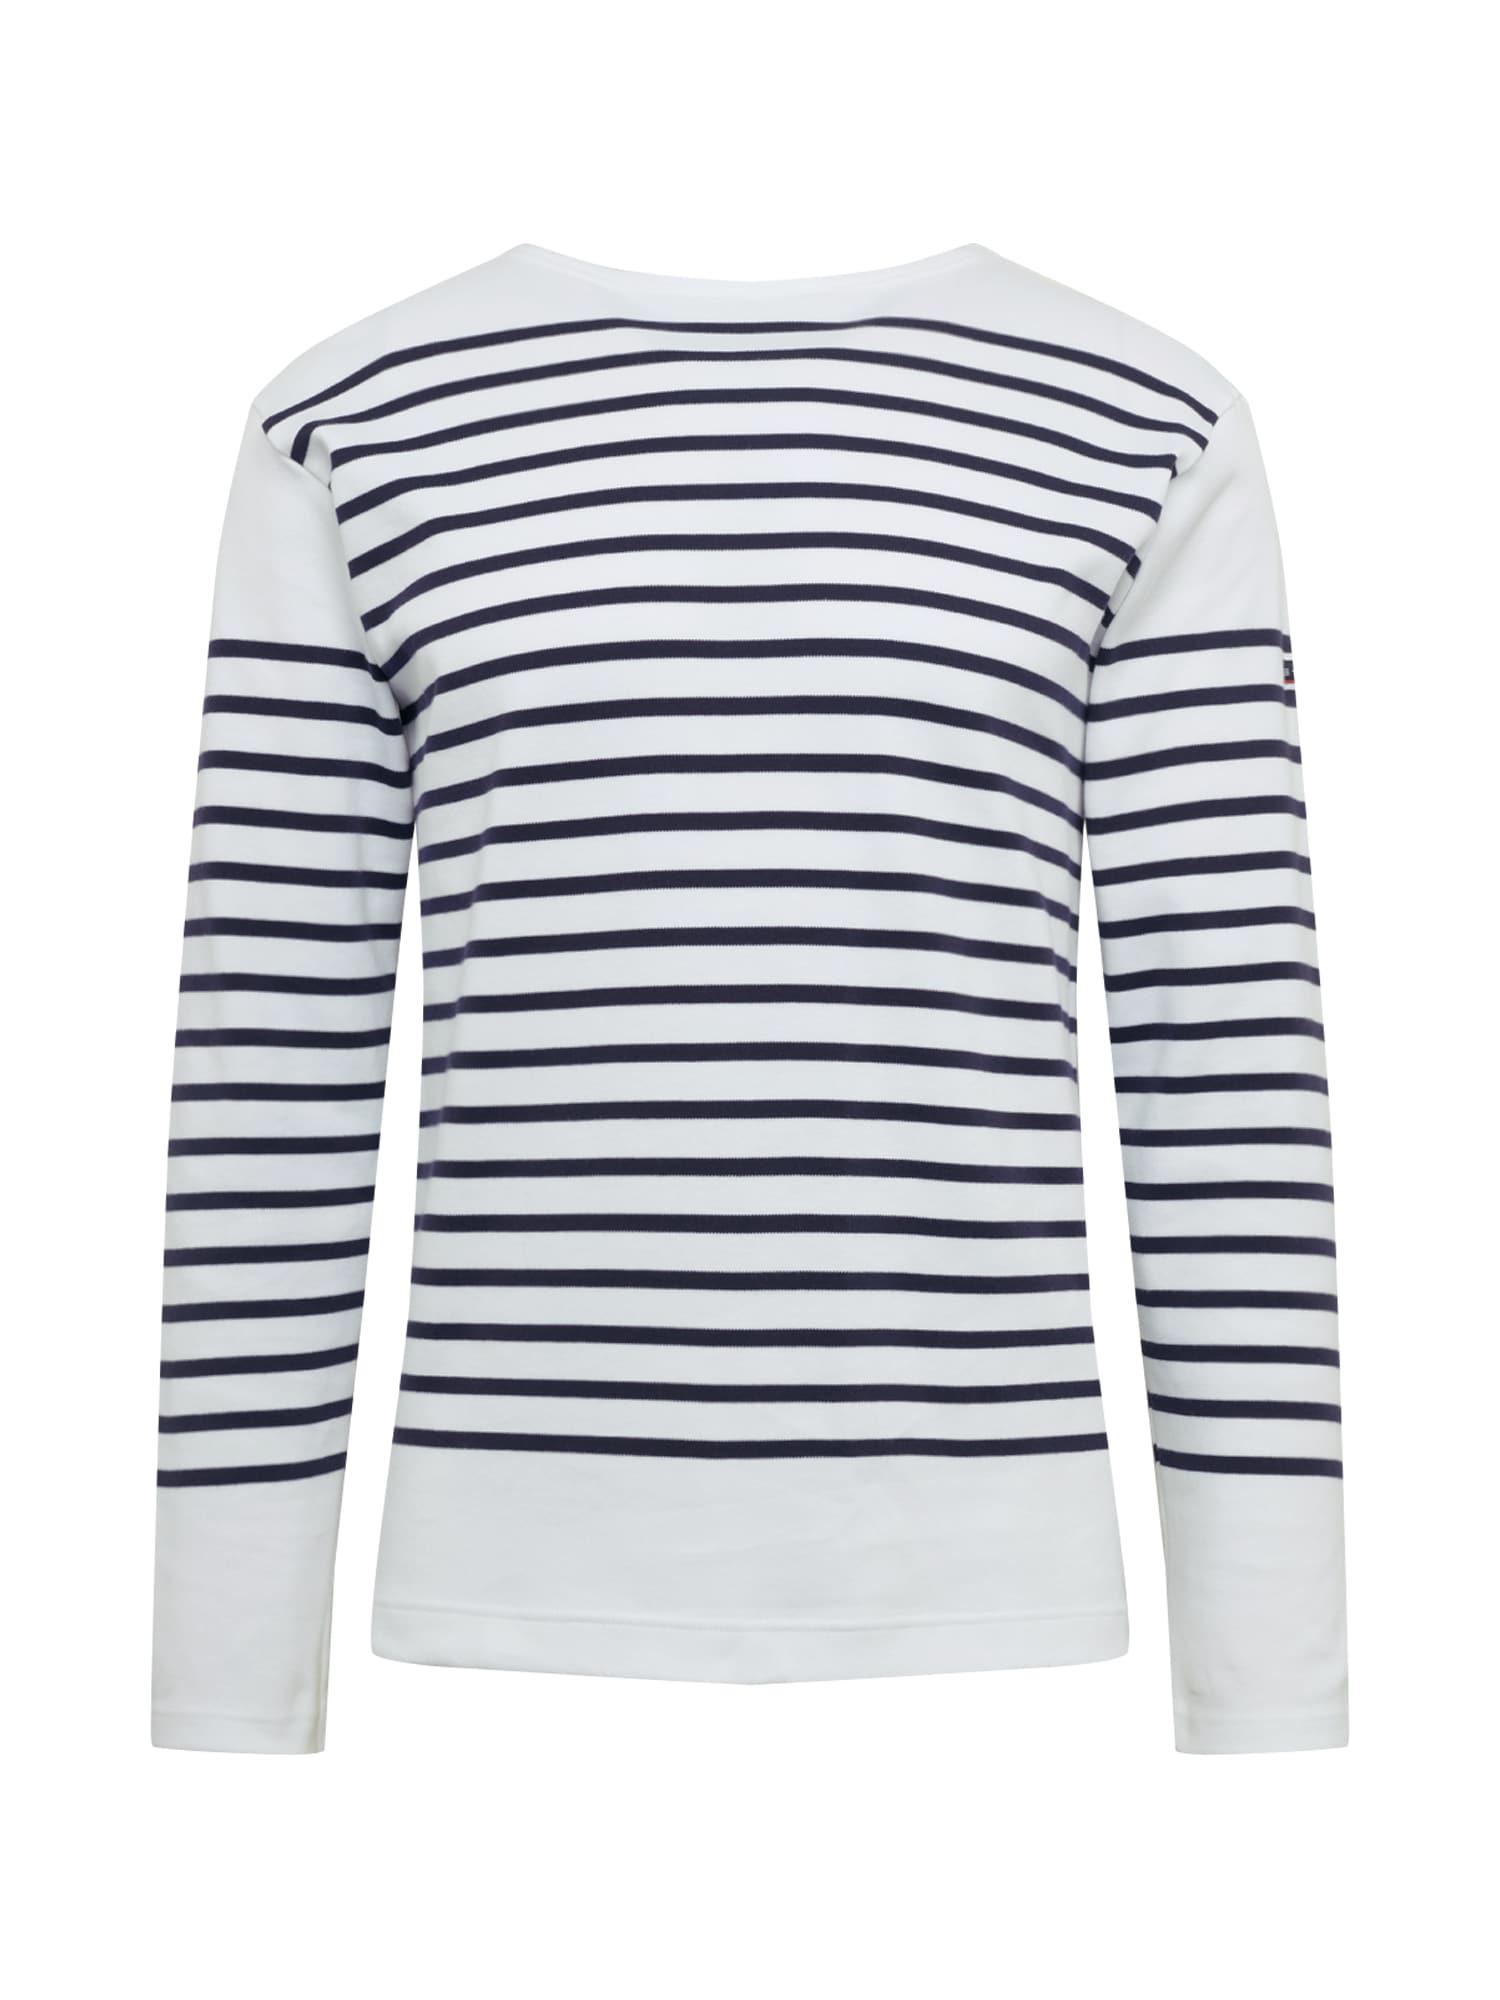 Armor Lux Marškinėliai 'Marinière Amiral Homme' tamsiai mėlyna / balta